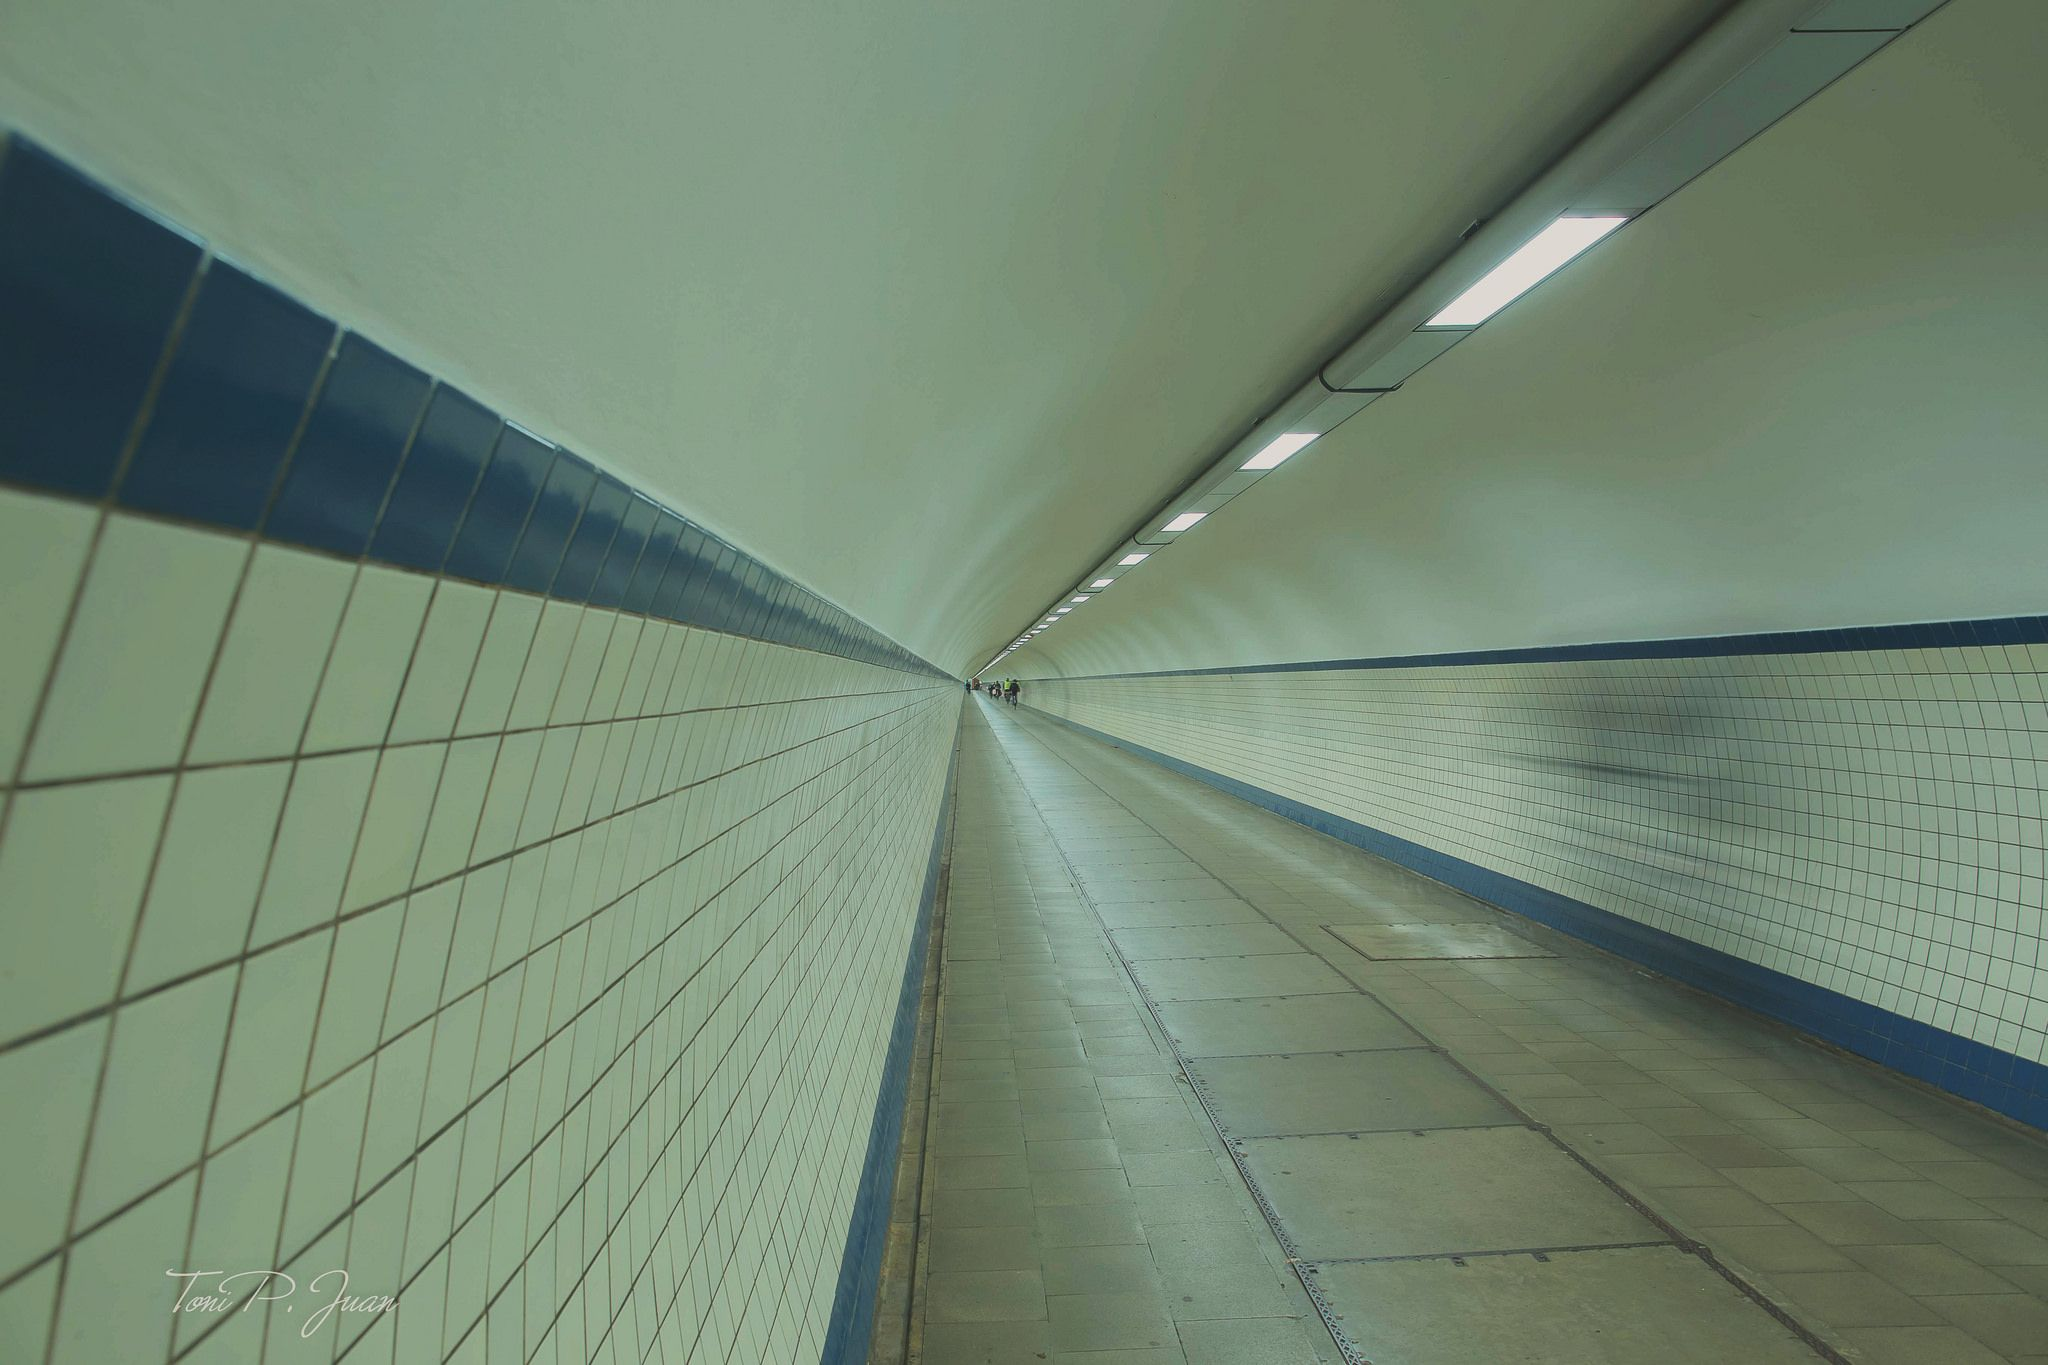 https://flic.kr/p/Fc7bnz | From tunnel.